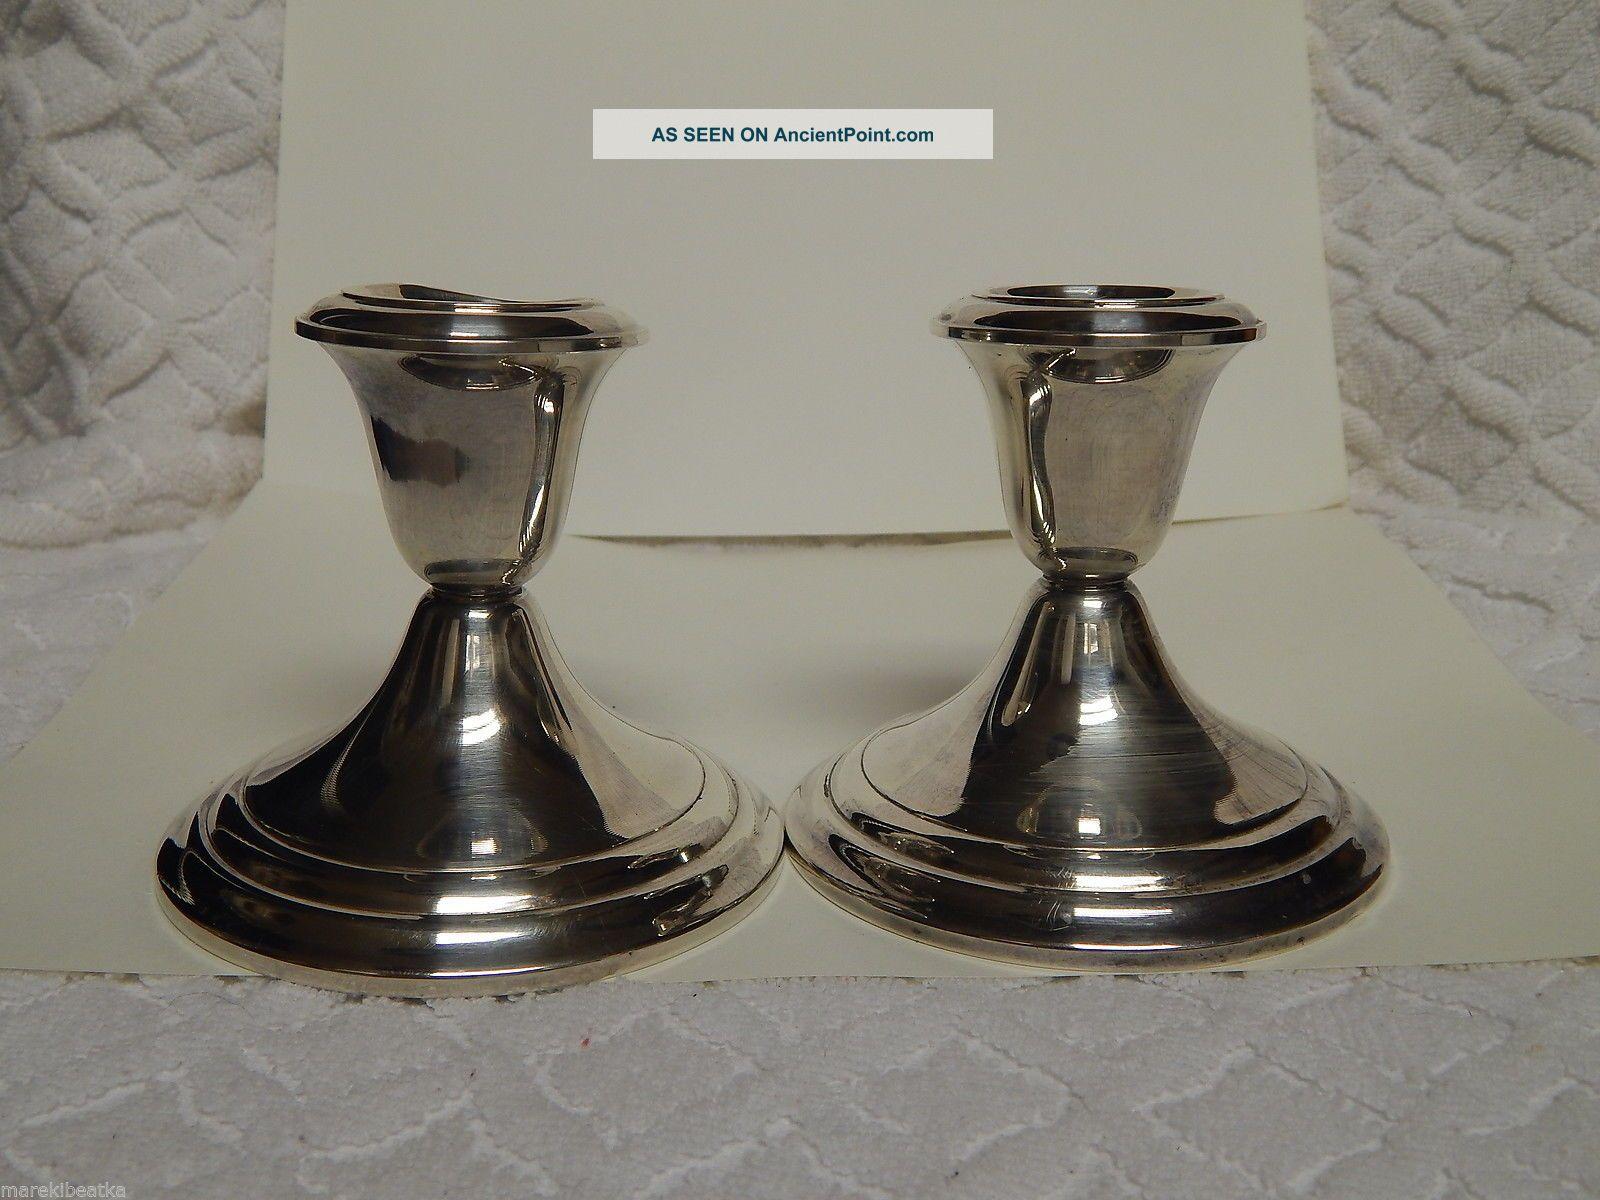 Gorham Sterling Silver Candlesticks 661,  Scrap Or Not Candlesticks & Candelabra photo